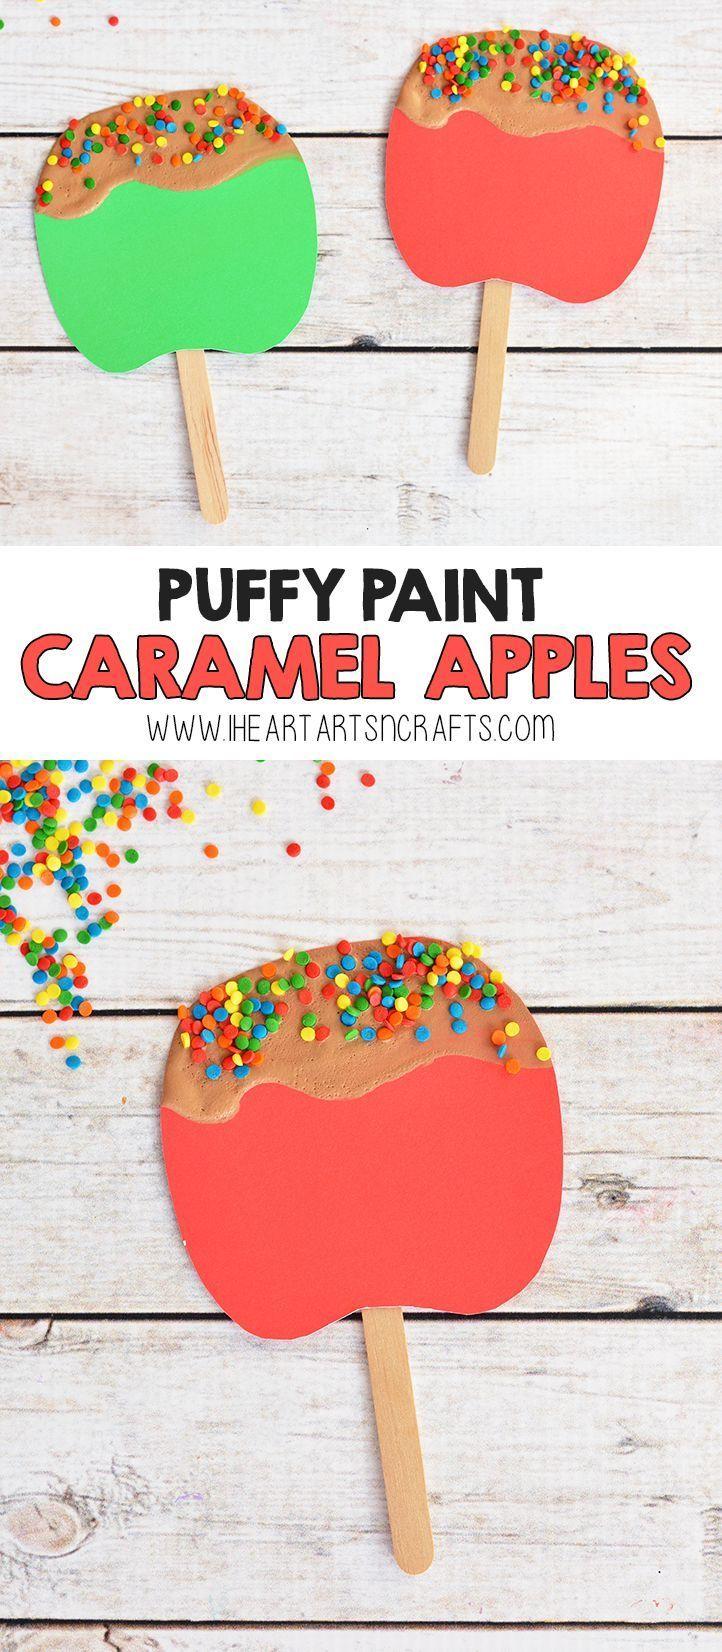 Puffy Paint Caramel Apple Craft For Kids   Fun Activities ...